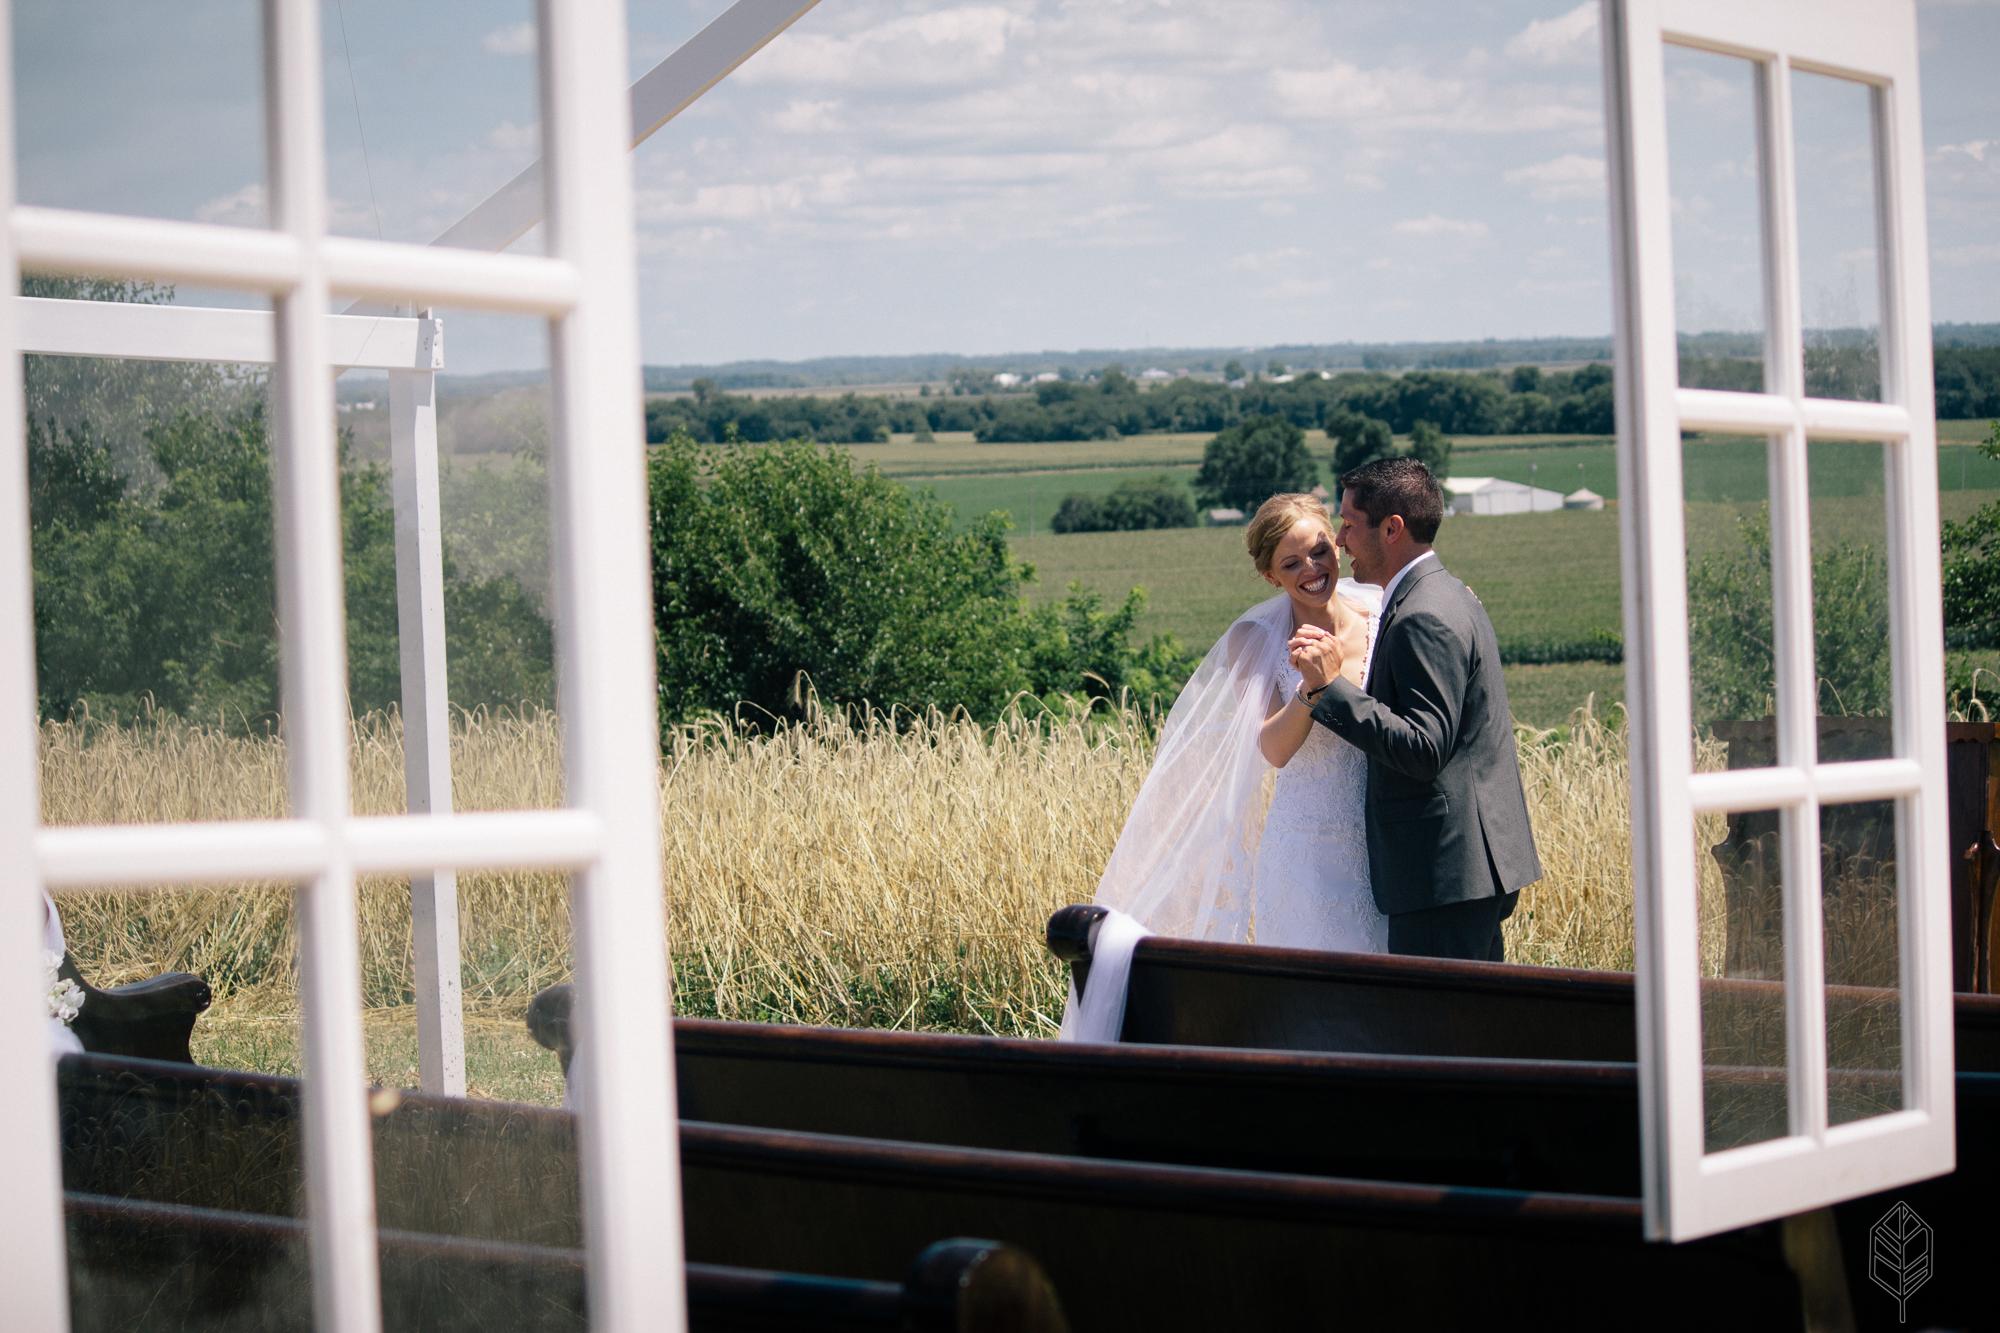 johnsonscreative_Ambrosia_wedding-6.jpg